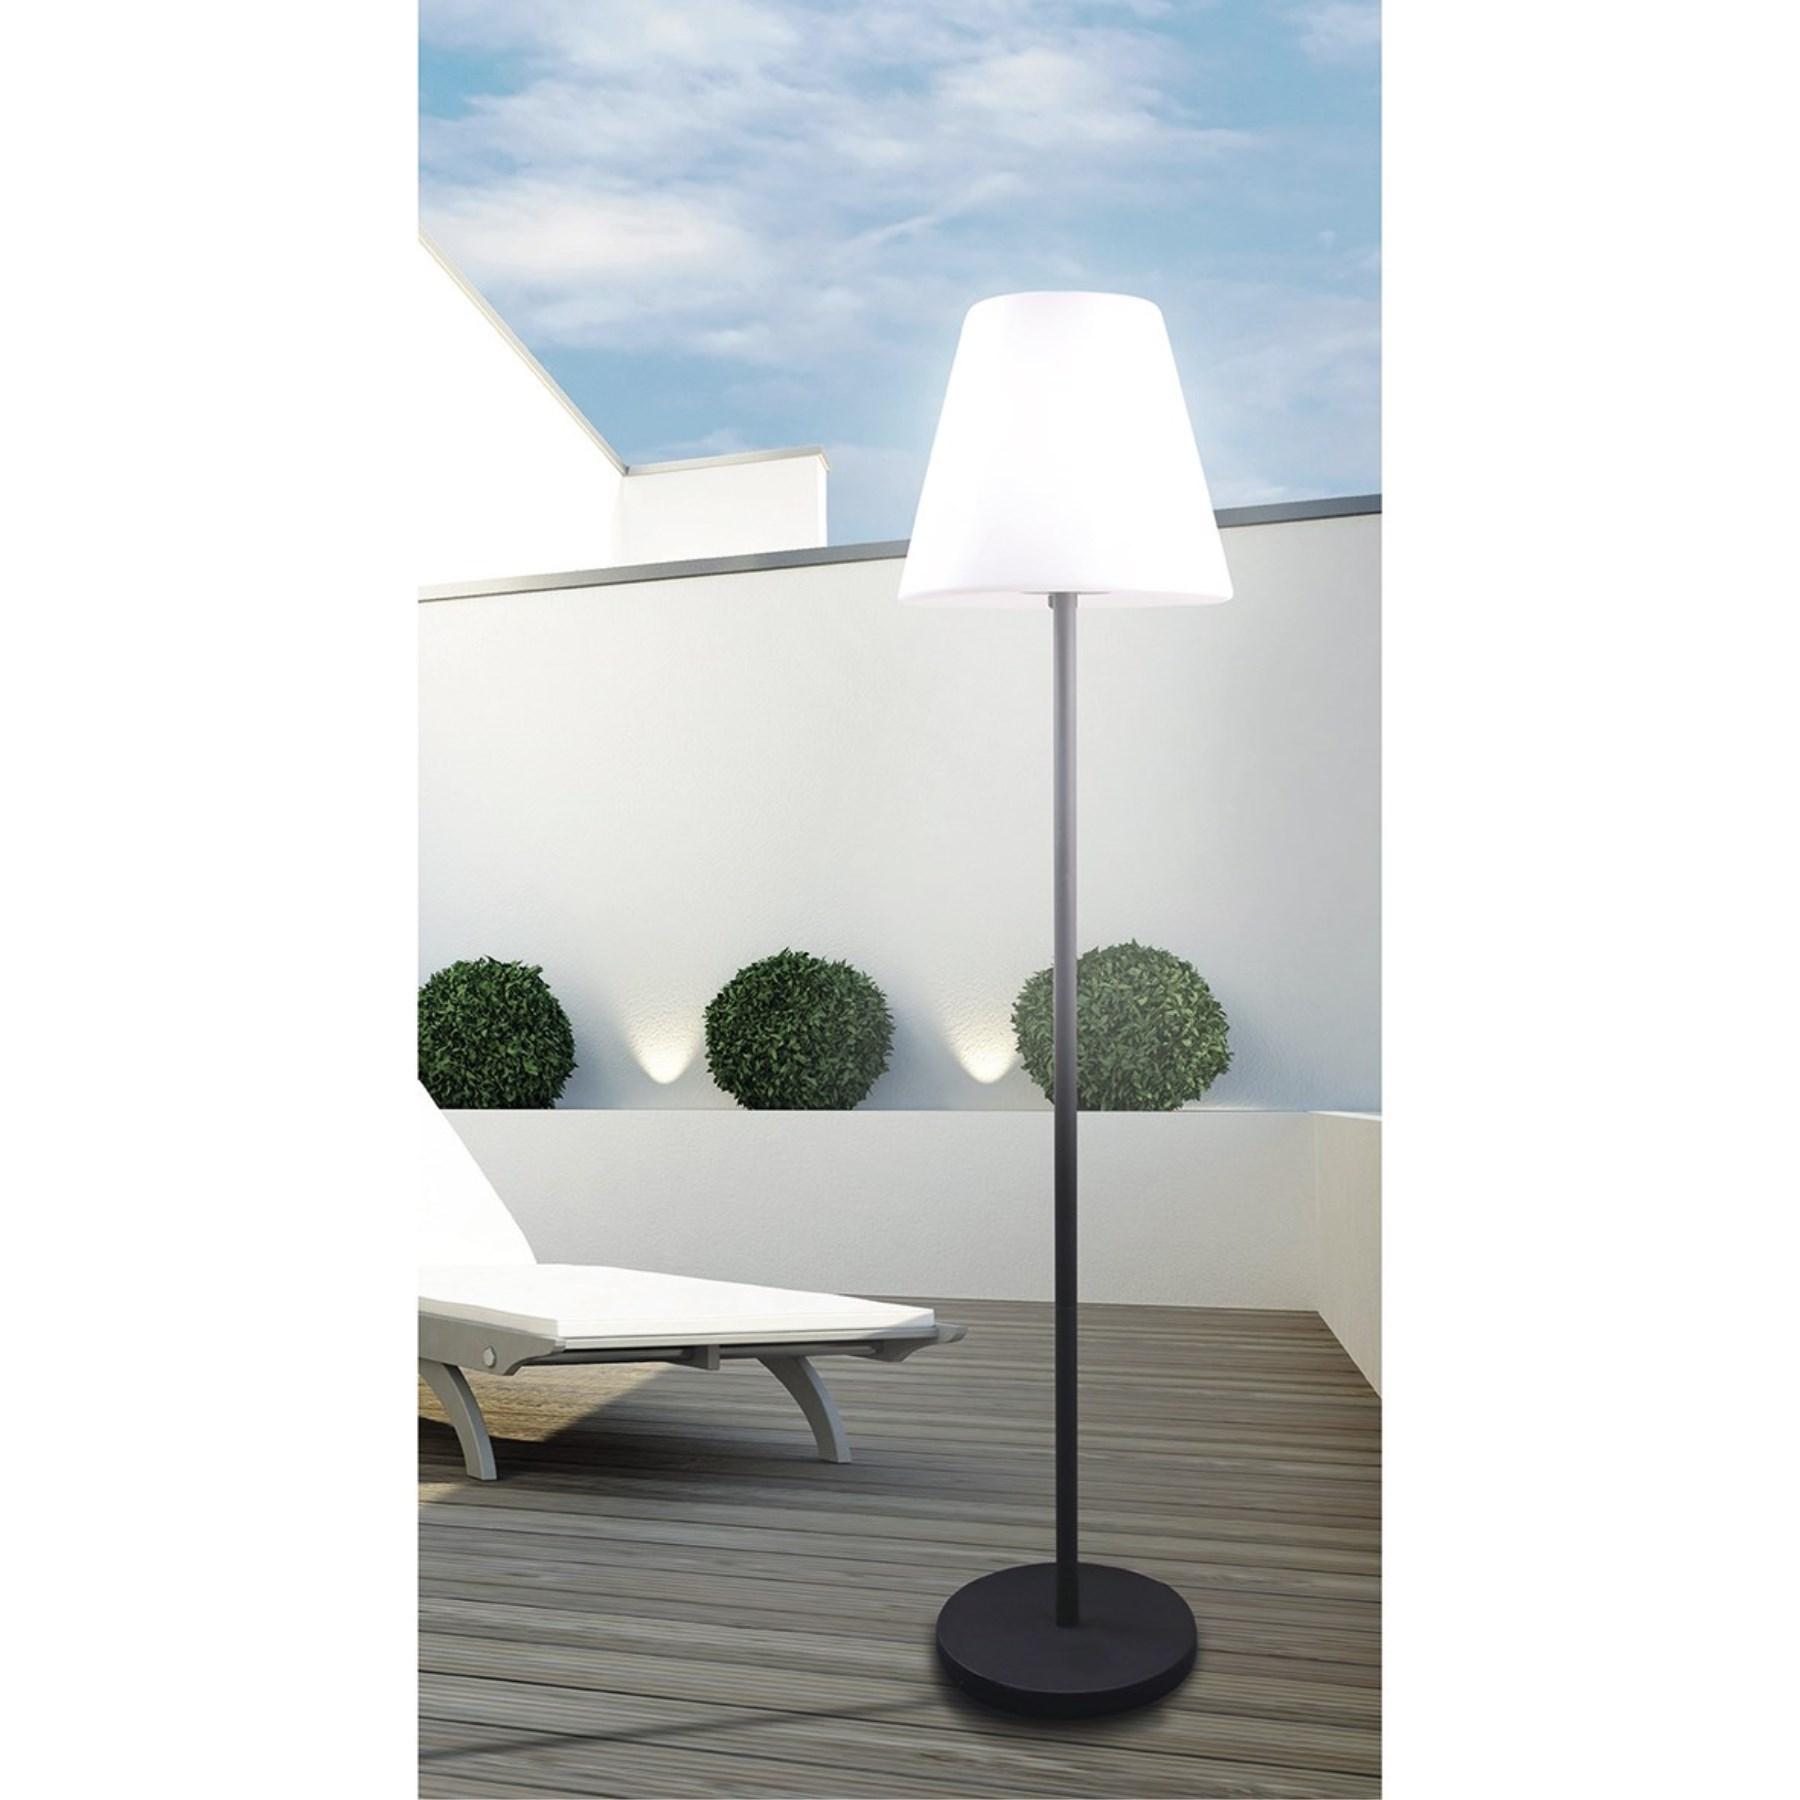 led stehlampe mit lautsprecher inkl fernbedienung 1238094 let 39 s doit starke marken. Black Bedroom Furniture Sets. Home Design Ideas